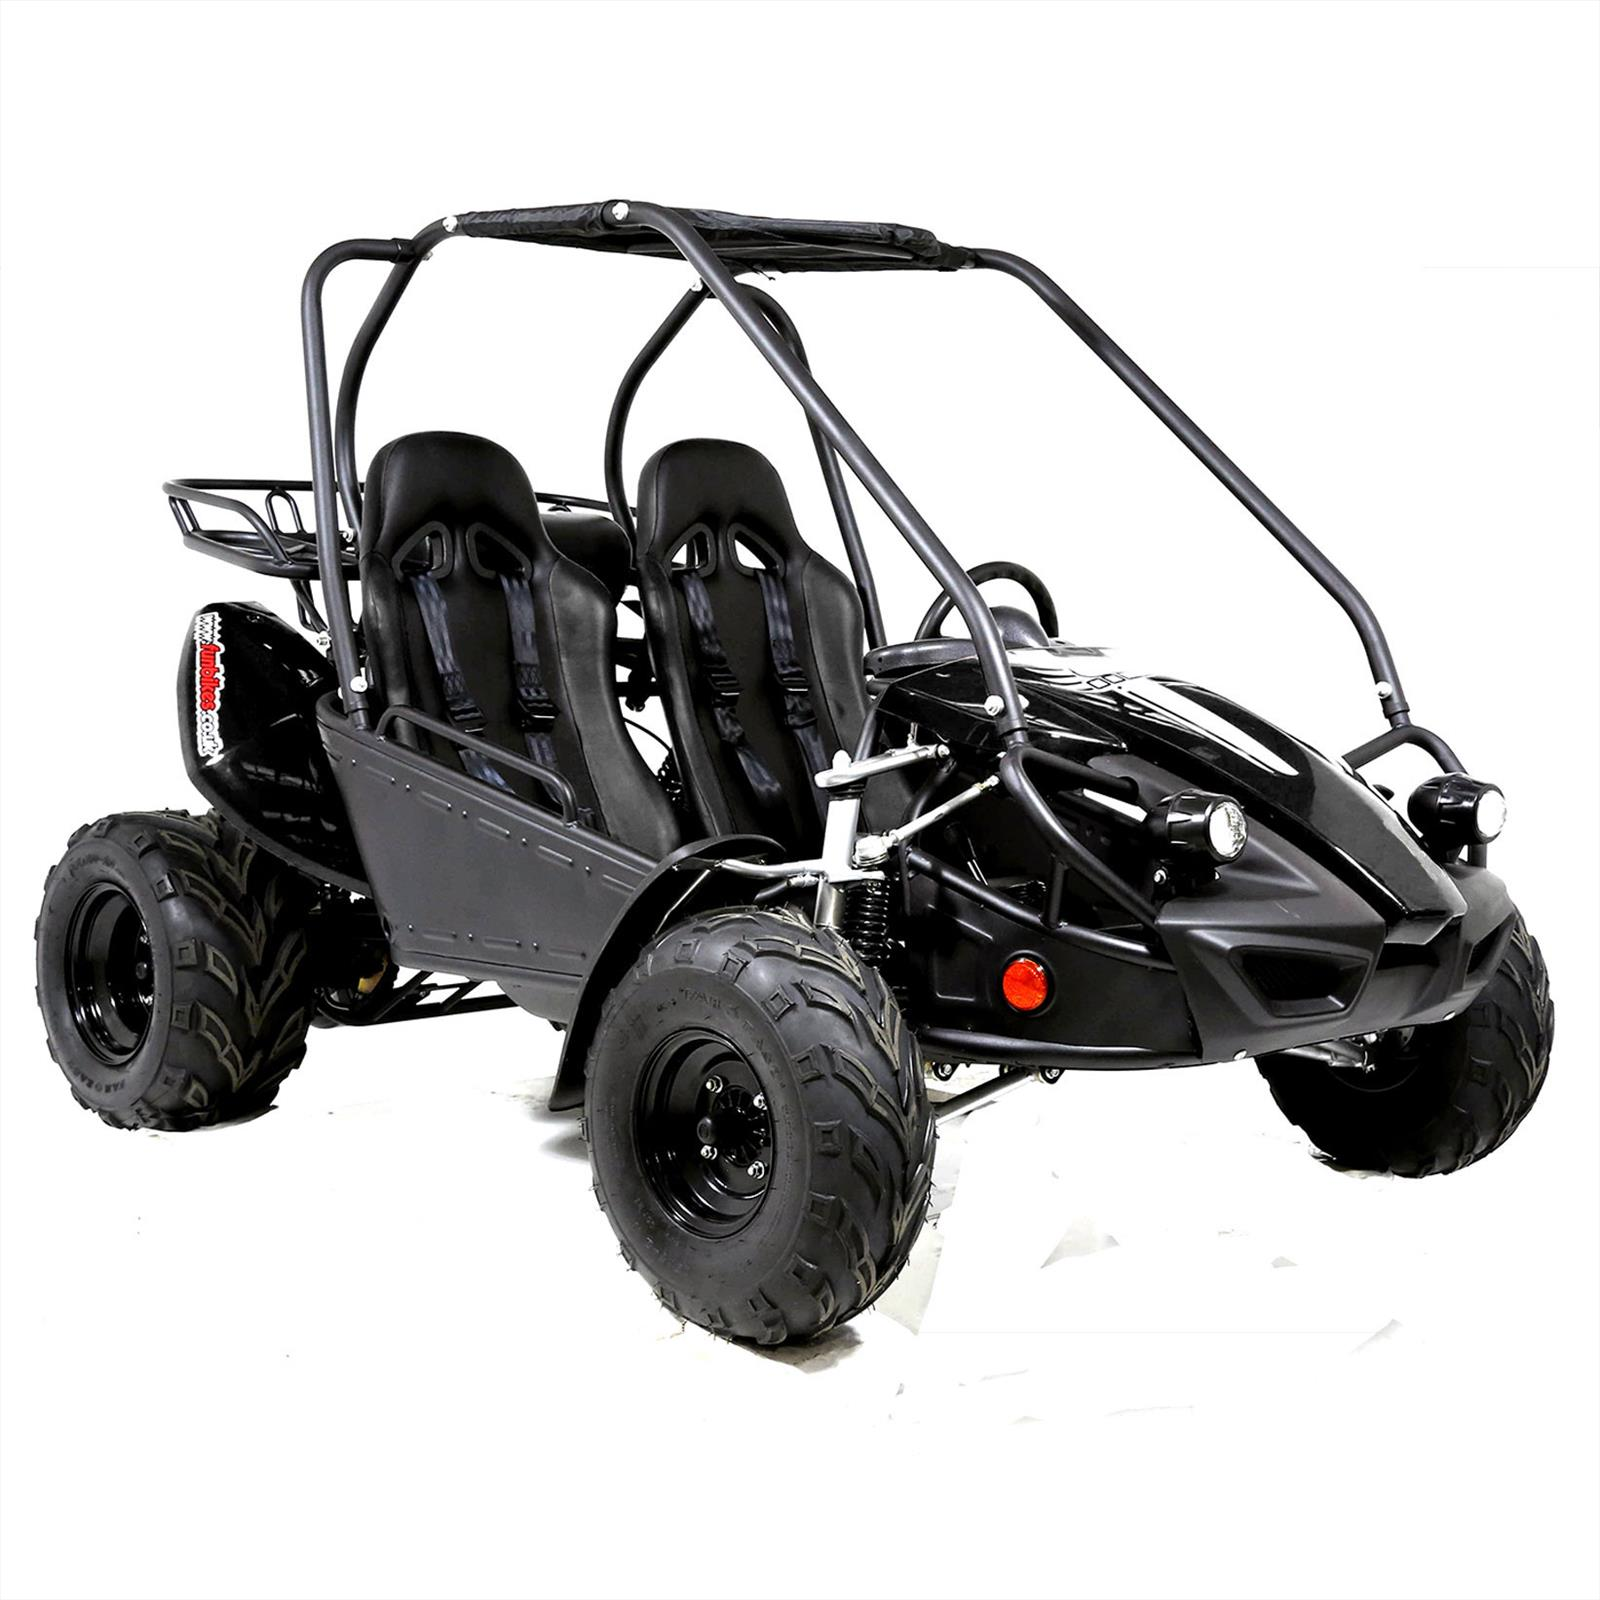 Funbikes GTS150 150cc Black Super Sport Off Road Buggy